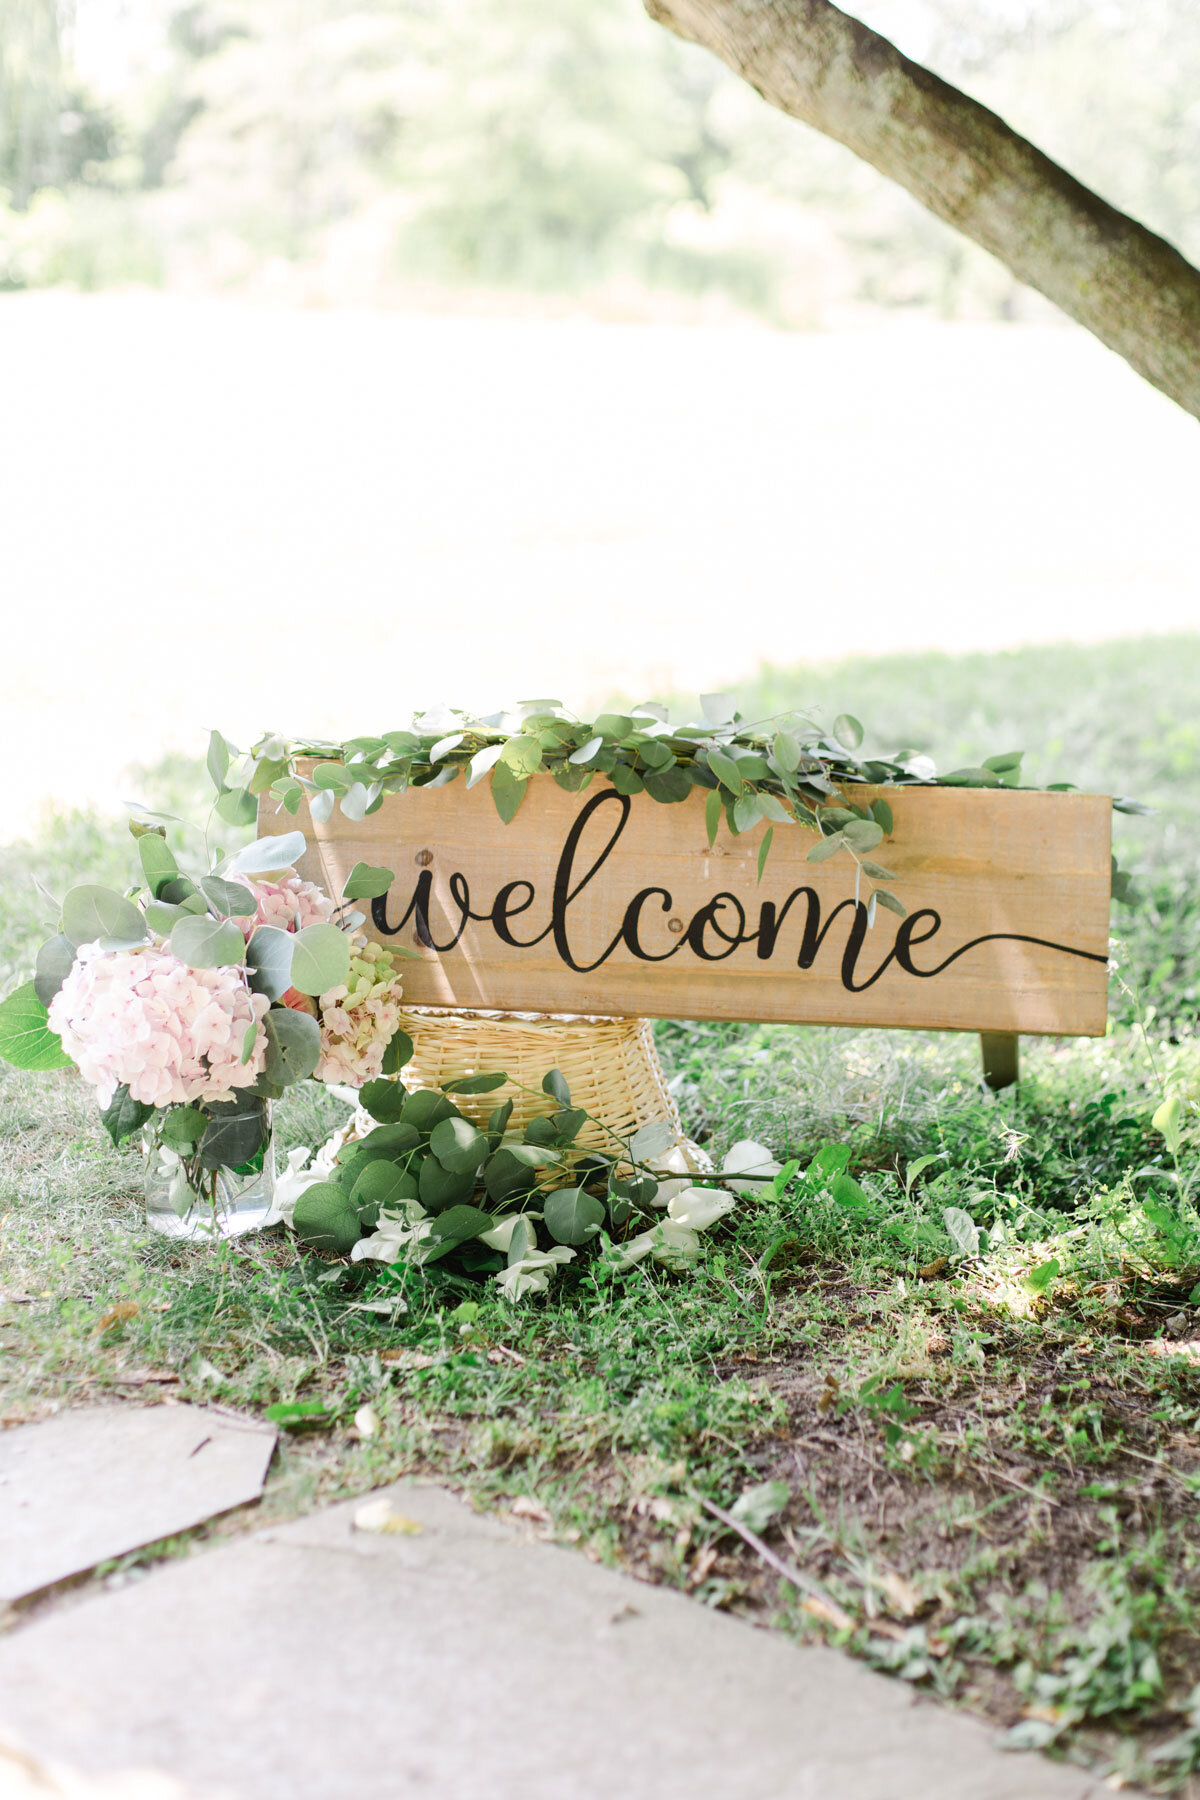 Chateau-des-Charmes-Wedding-Summer-Vineyard-Bride-Niagara-on-the-Lake-photos-by-Gemini-Photography-Ontario-0010.jpg